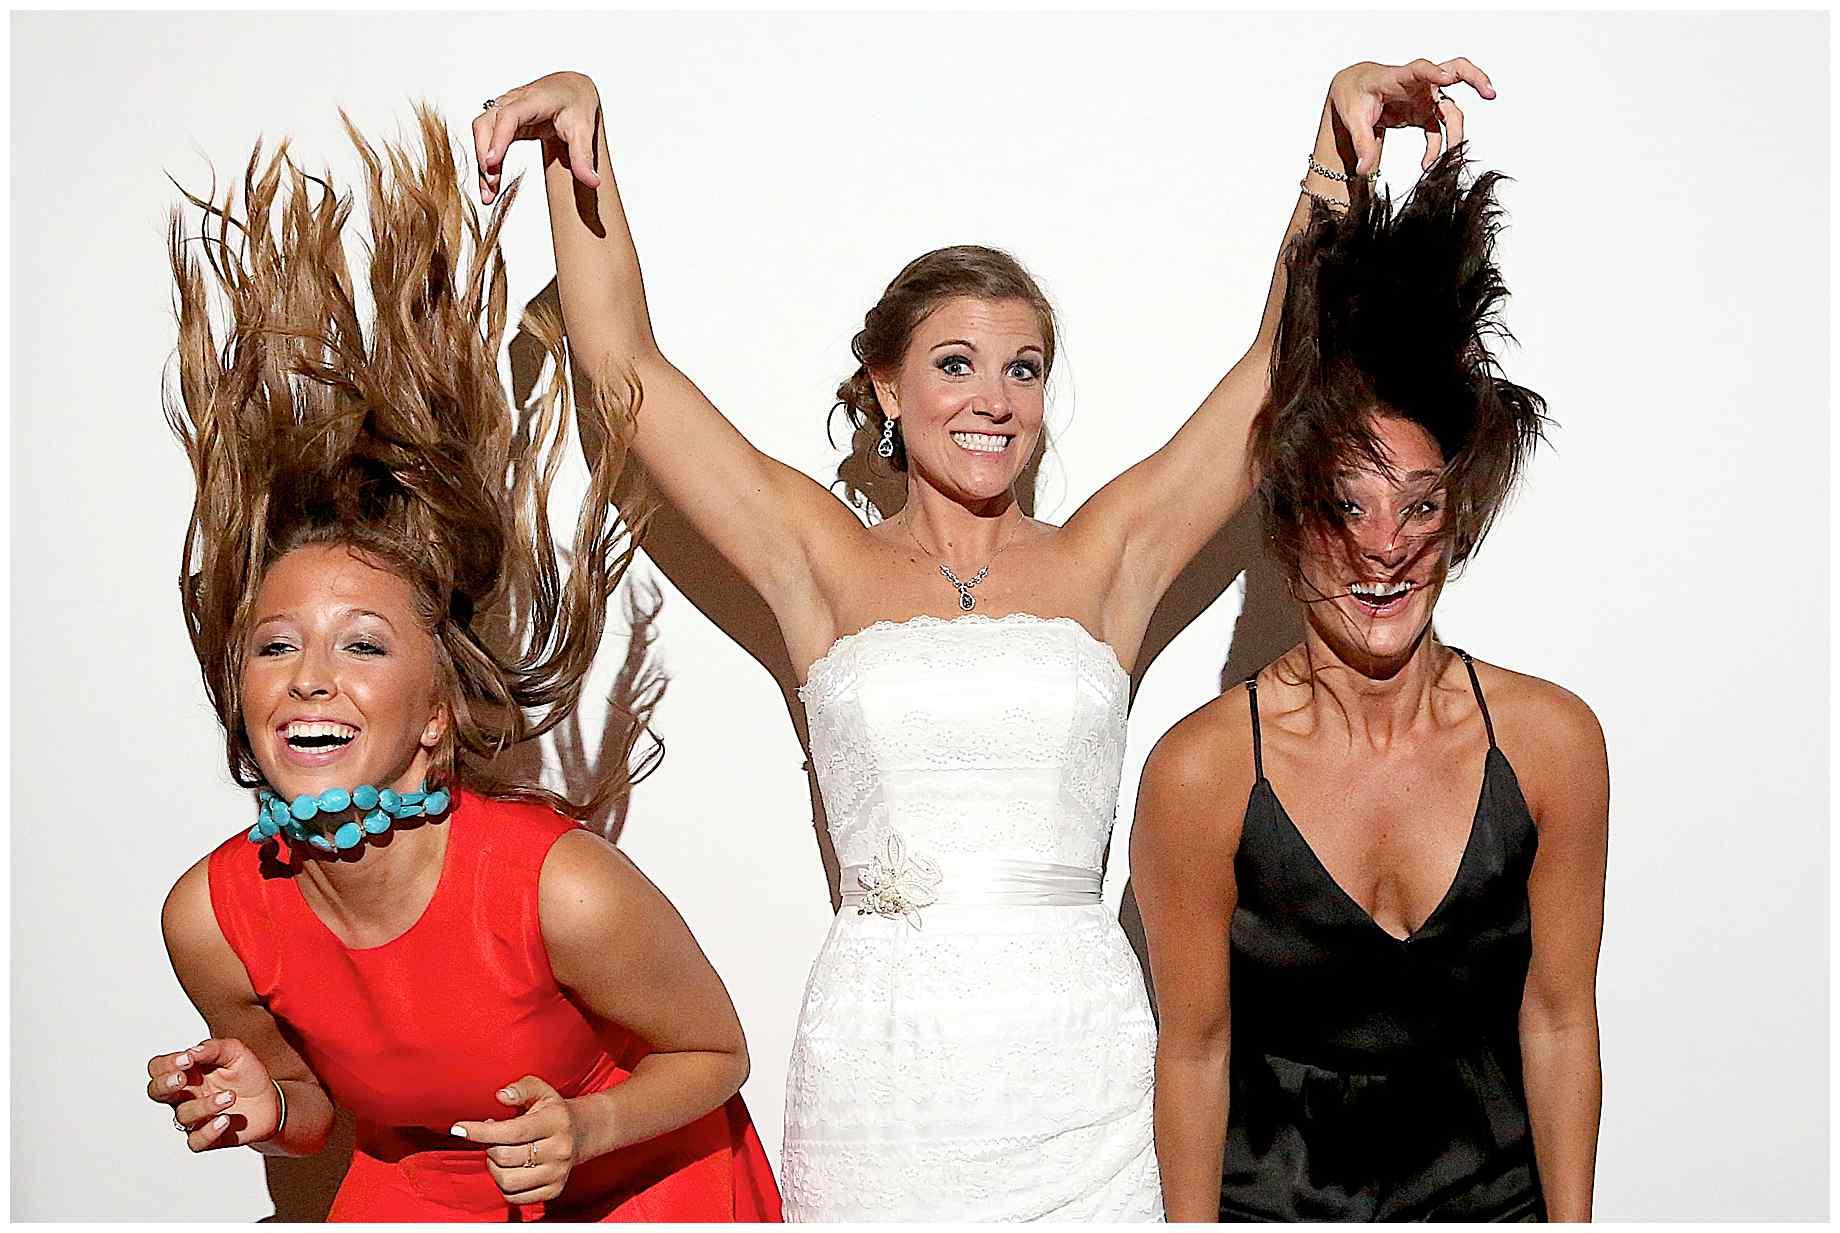 best-wedding-photos-2014-winner-04